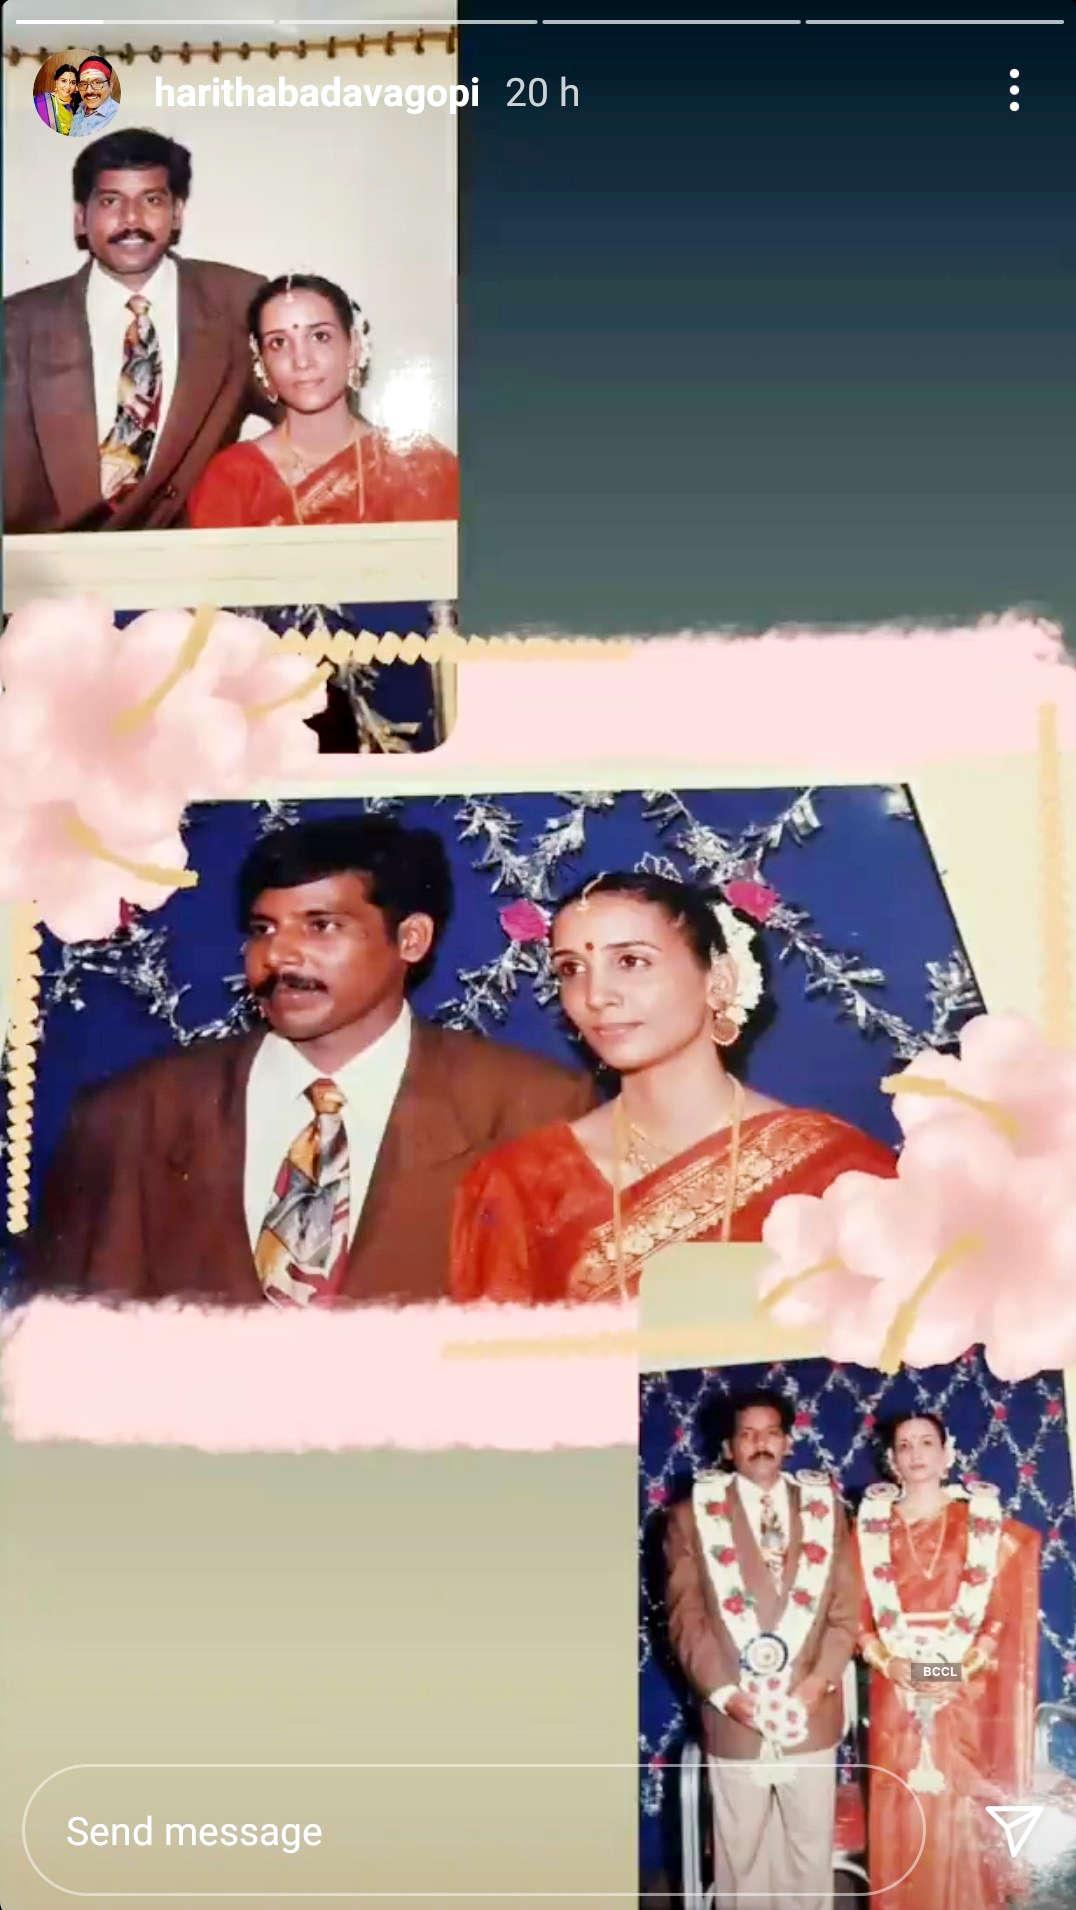 Badava Gopi and Haritha celebrated their 25th wedding anniversary